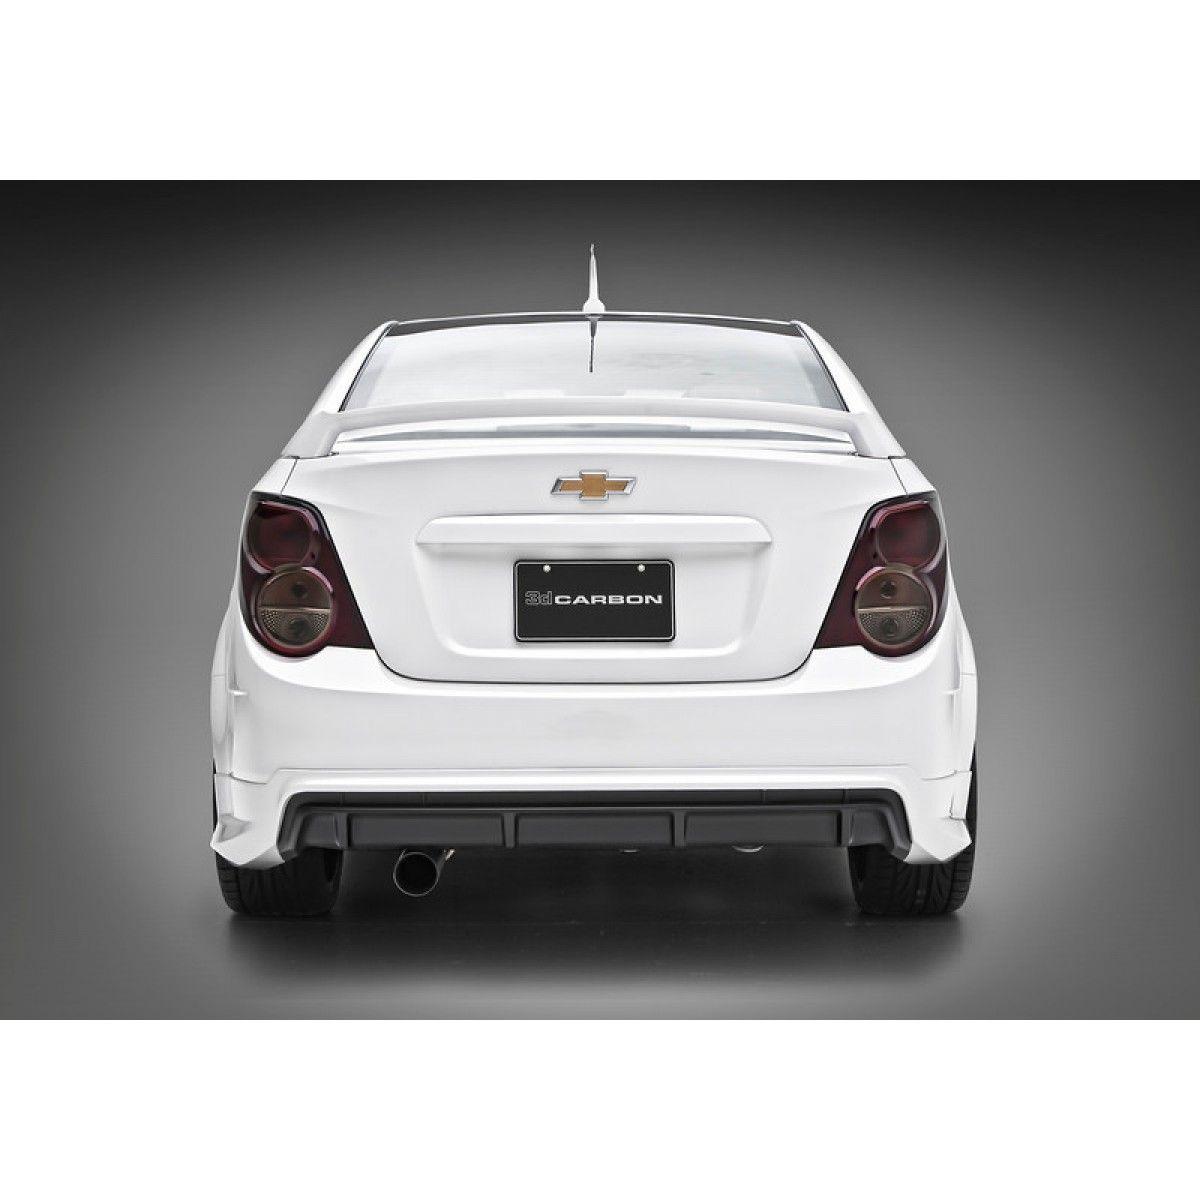 3dcarbon Chevy Gm Sonic 4dr Sedan 2012 2013 5 Piece Body Kit